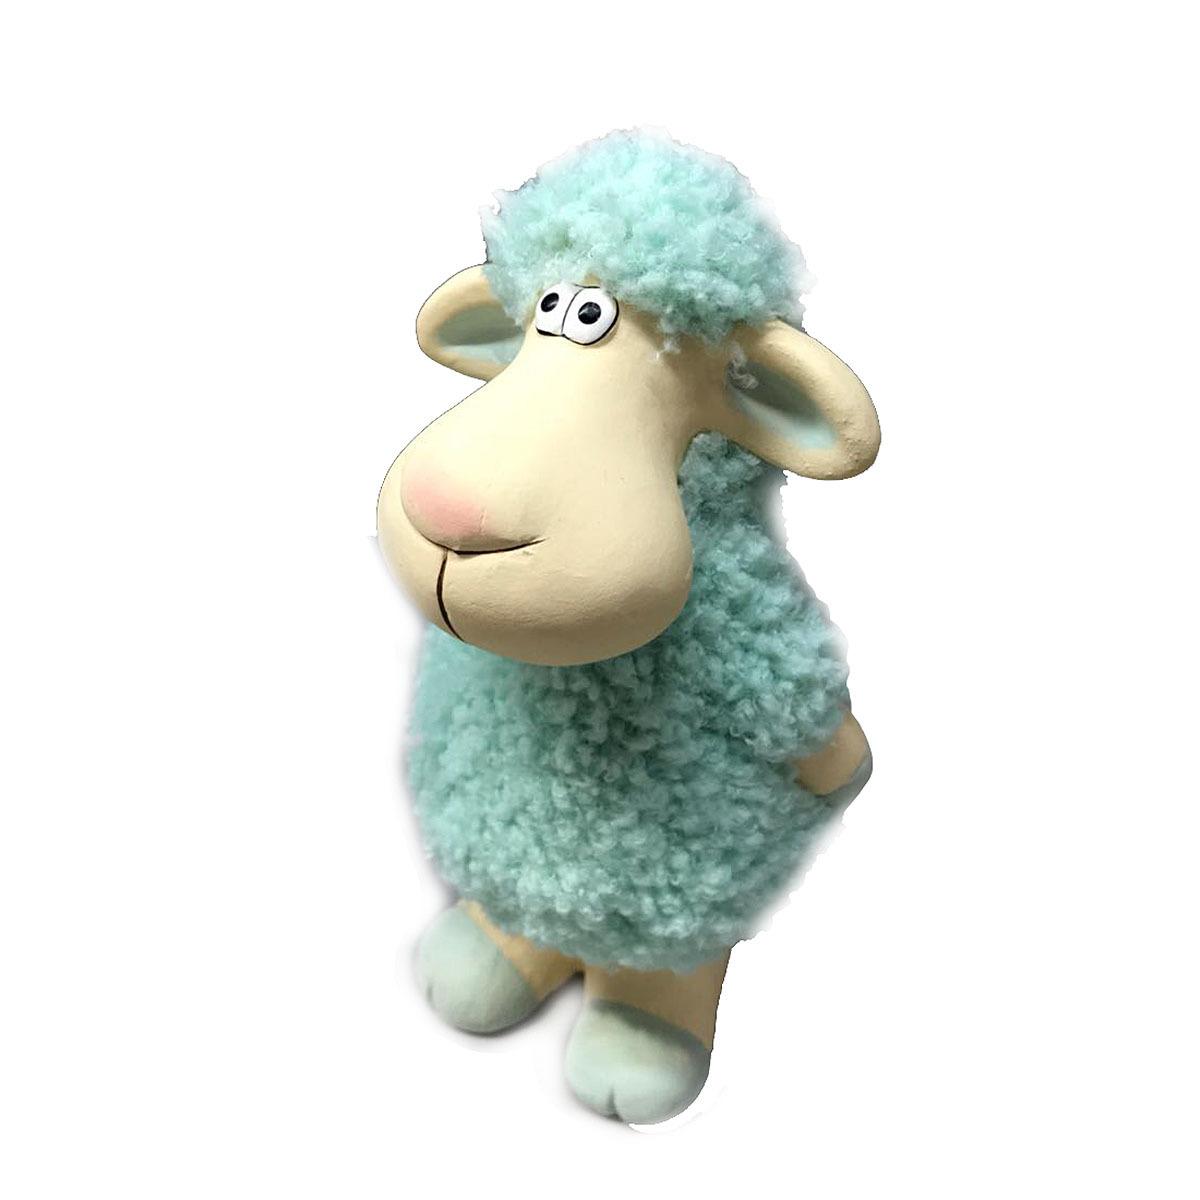 Фигурка декоративная Village People Задумчивая овечка, кремовый, голубой, 21,5 х 11 х 10 см цены онлайн